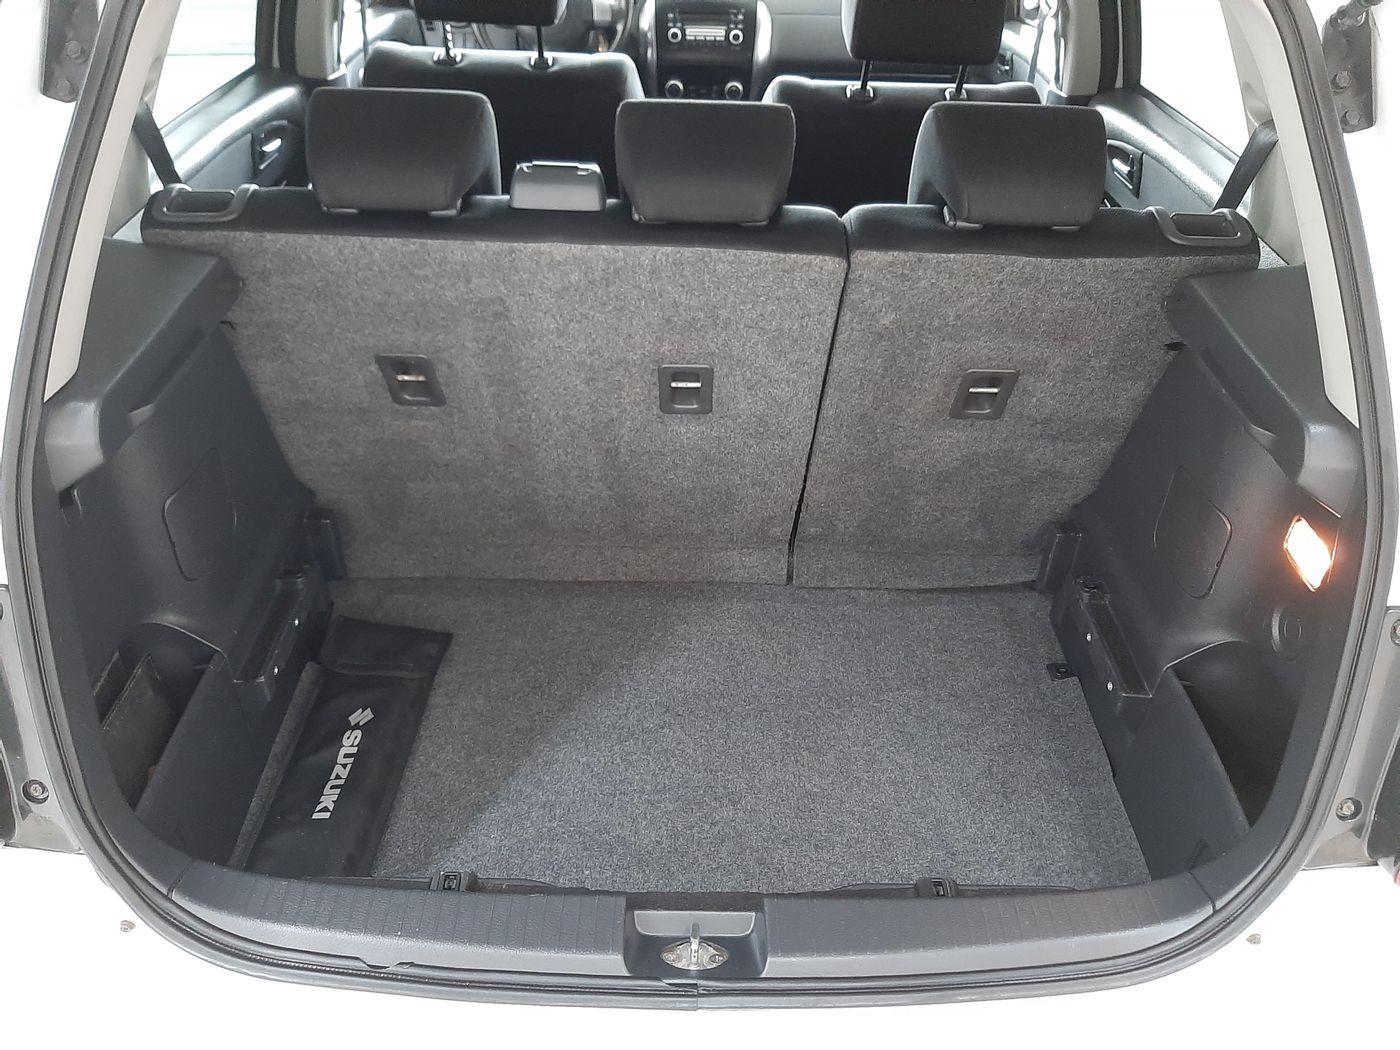 Suzuki SX4 2.0 16V 145cv 4WD 5p Mec.